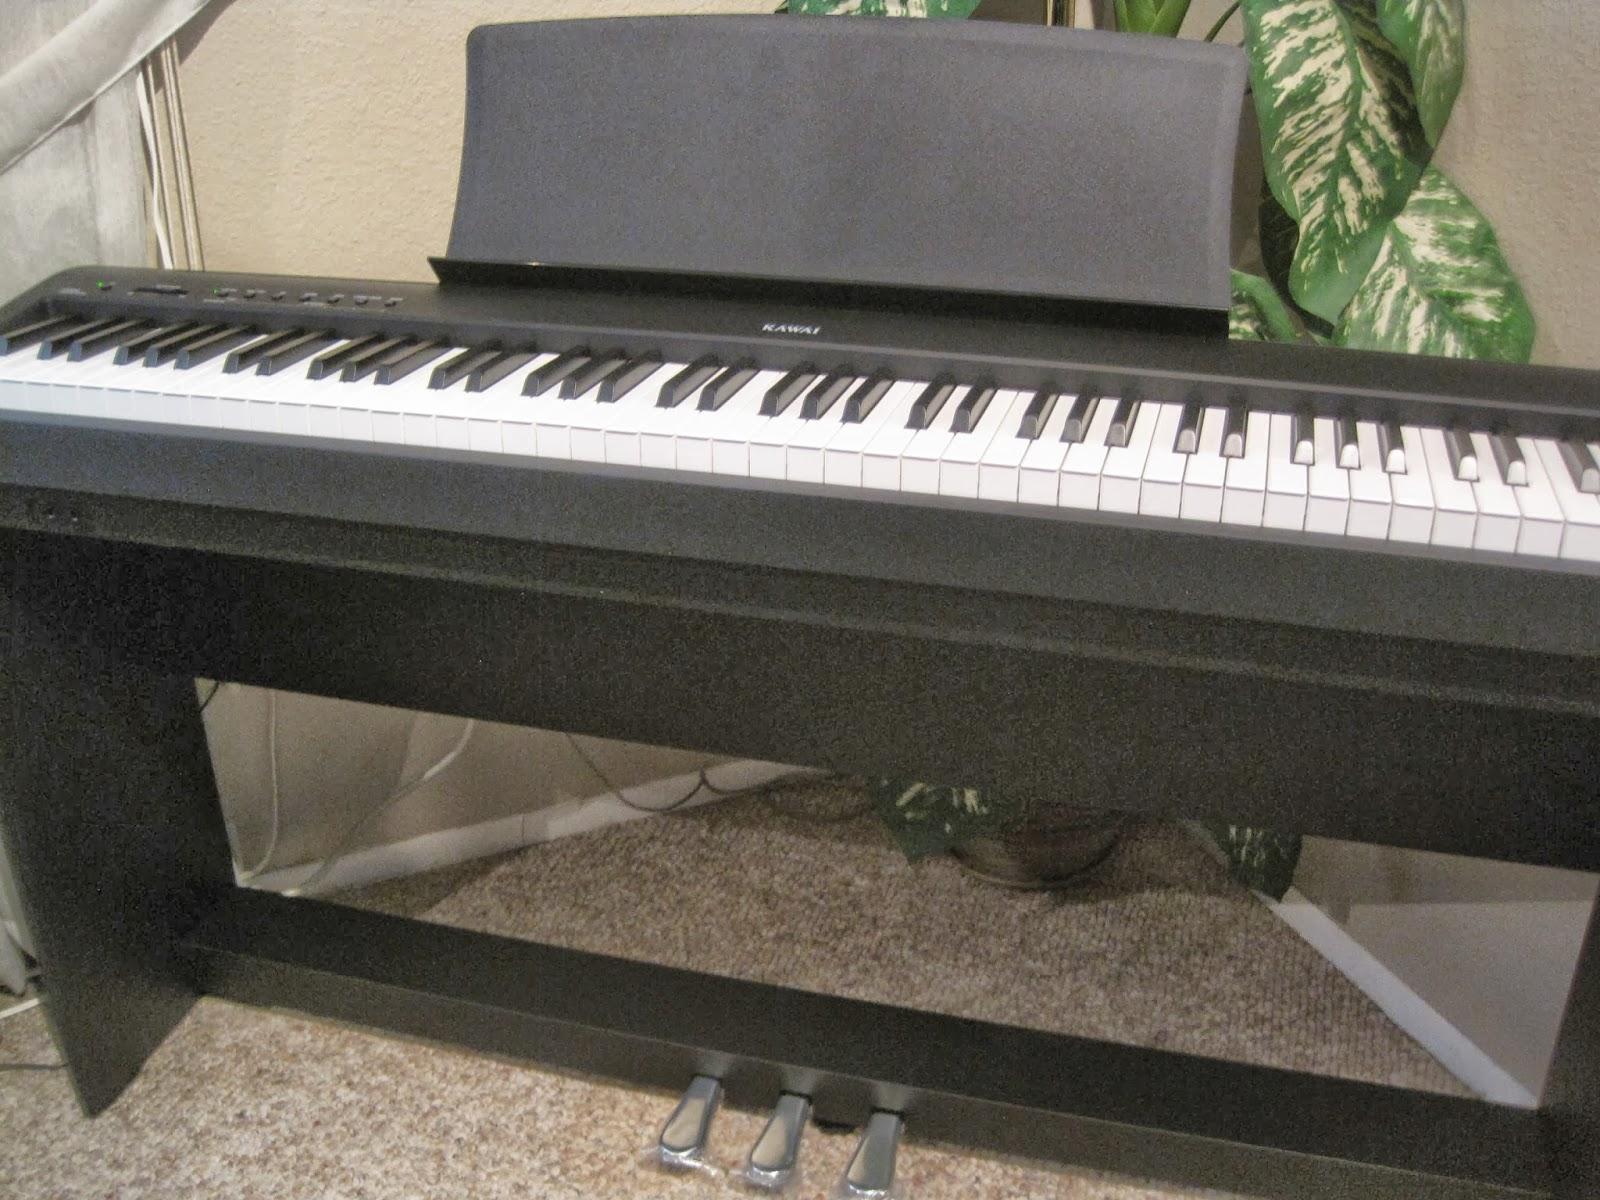 az piano reviews review kawai es100 digital piano recommended. Black Bedroom Furniture Sets. Home Design Ideas